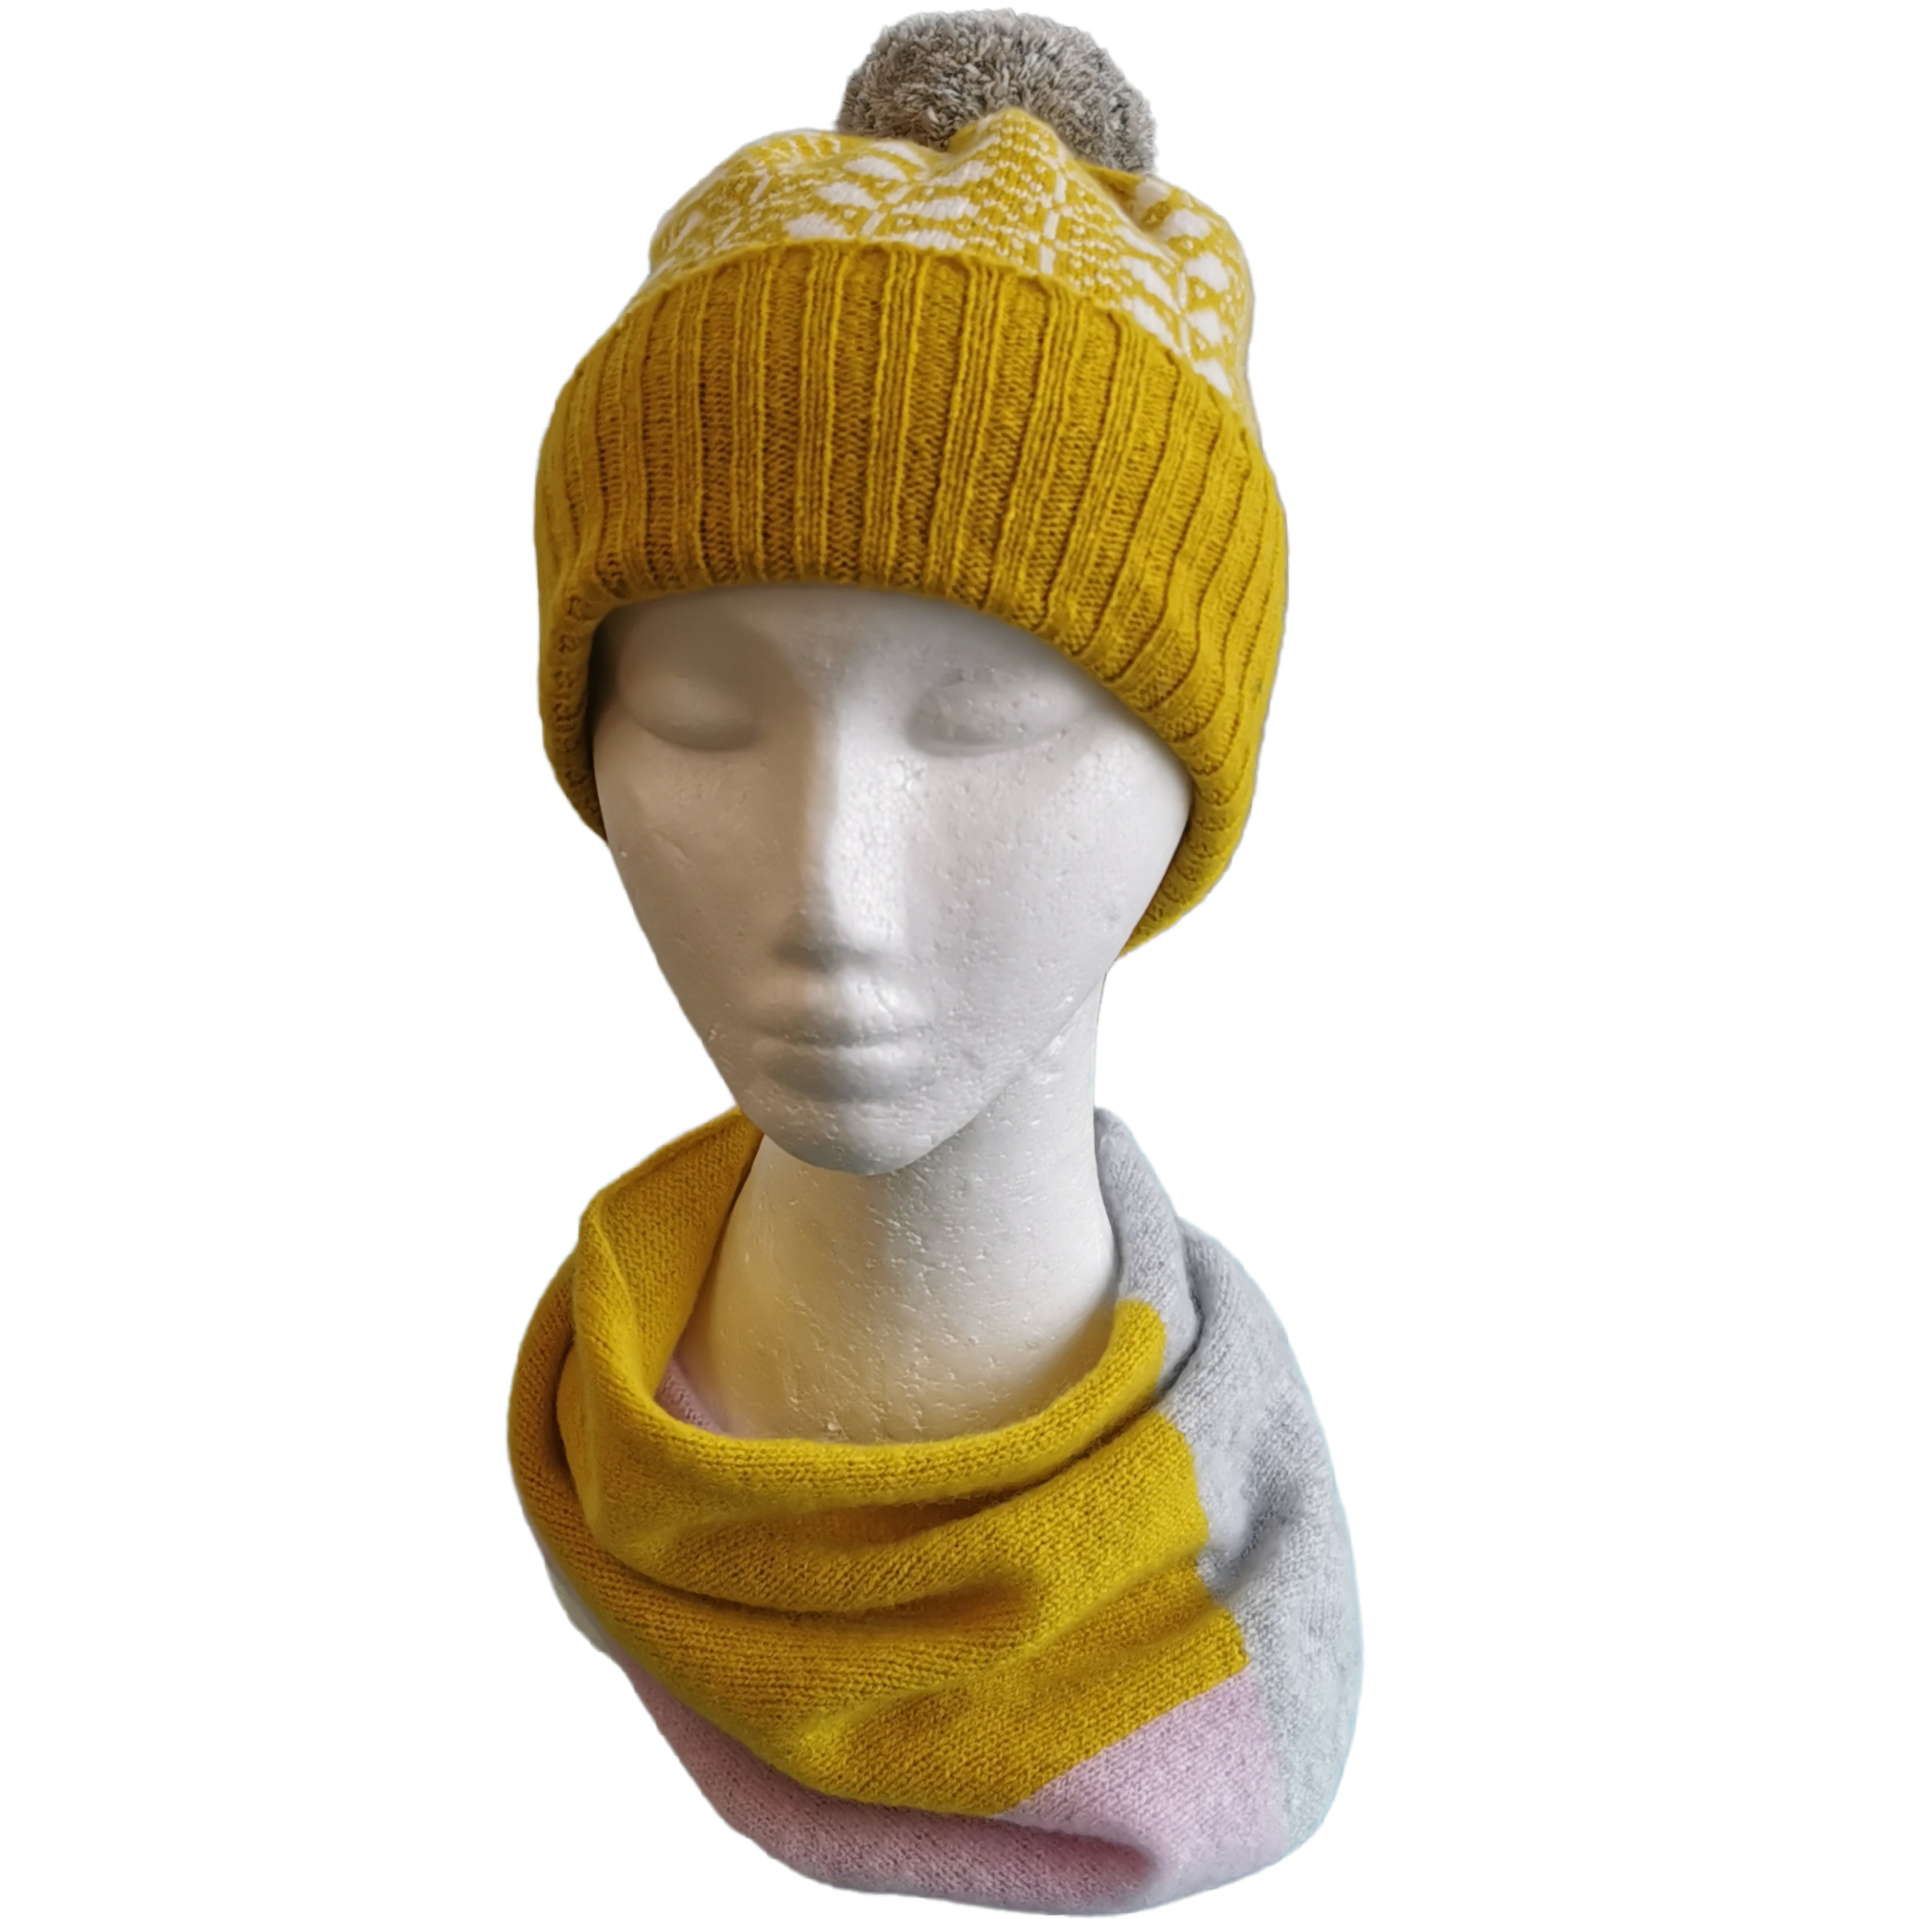 Leaf Design Pom-Pom Hat by Scarlet Knitwear